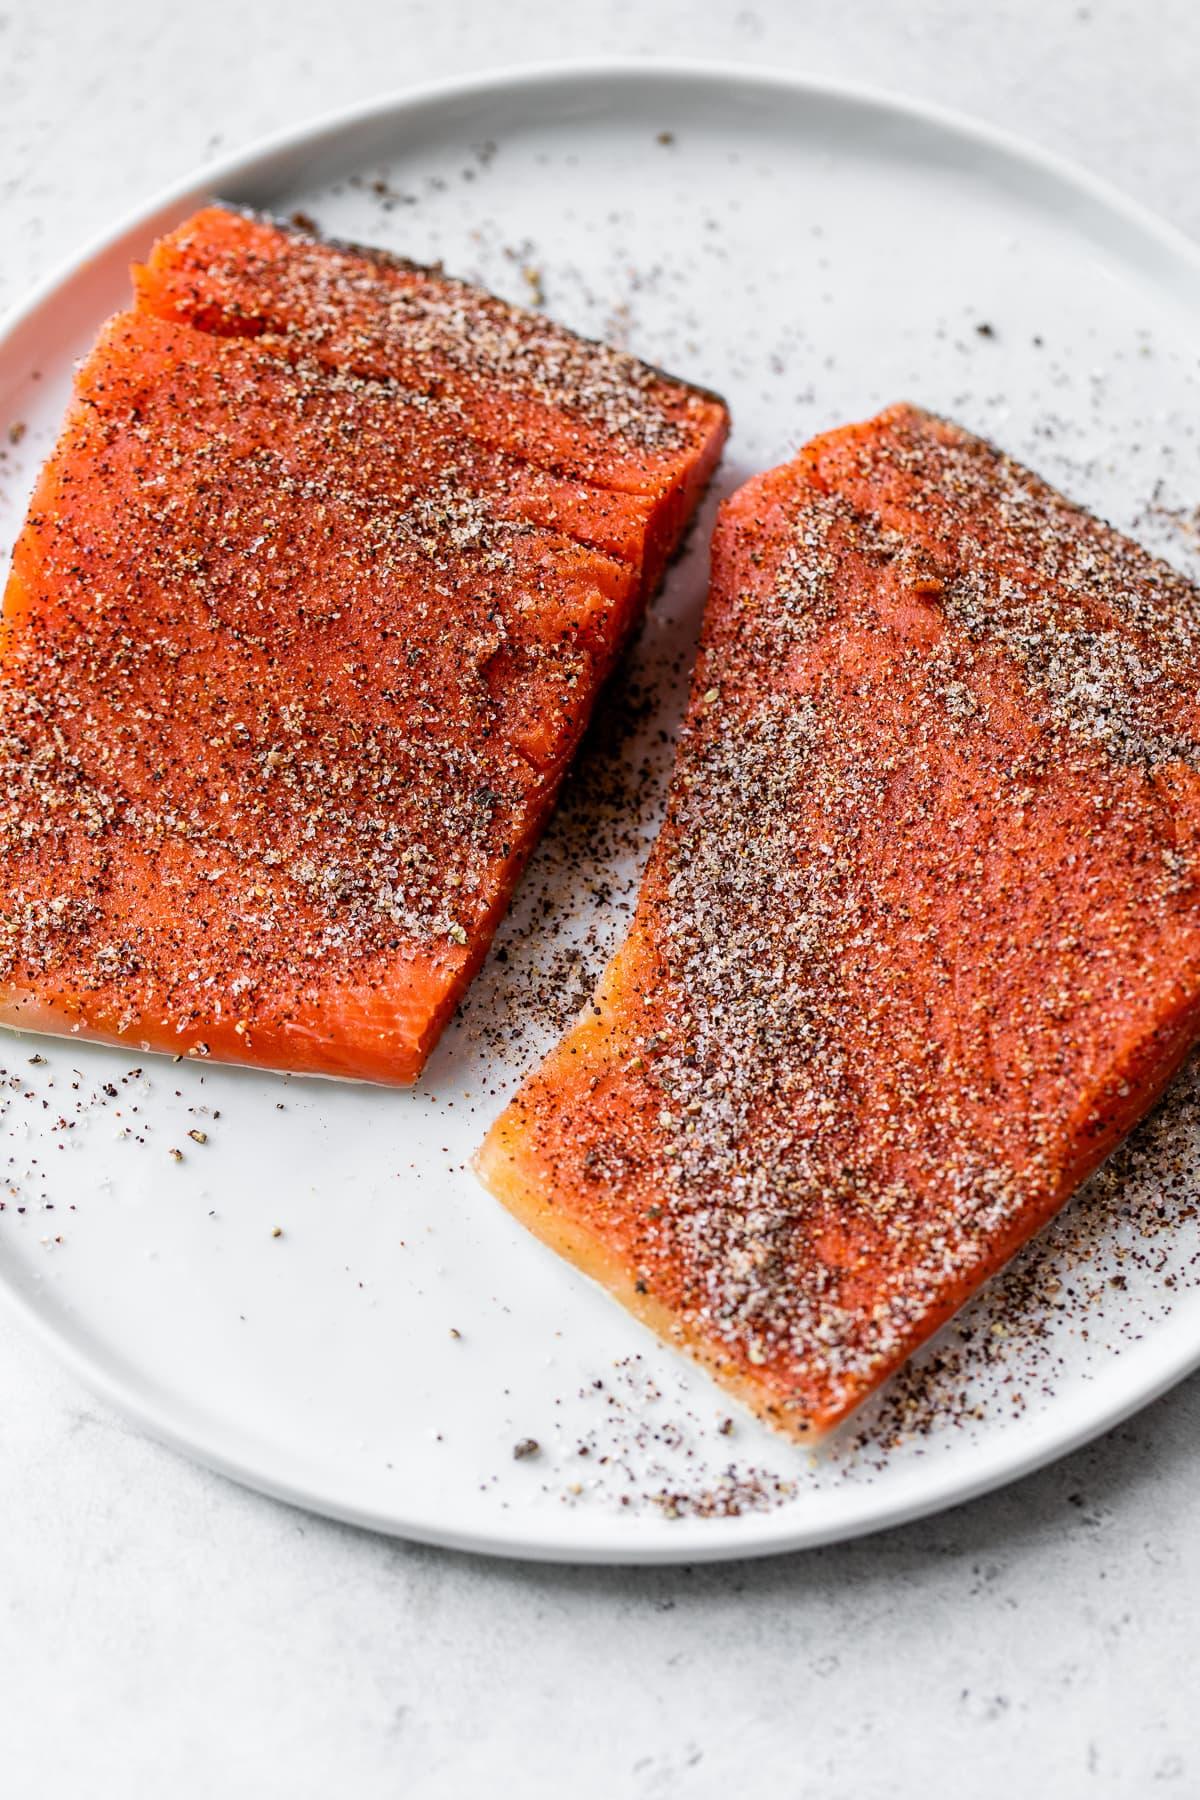 Salmon filets seasoned with a dry rub.